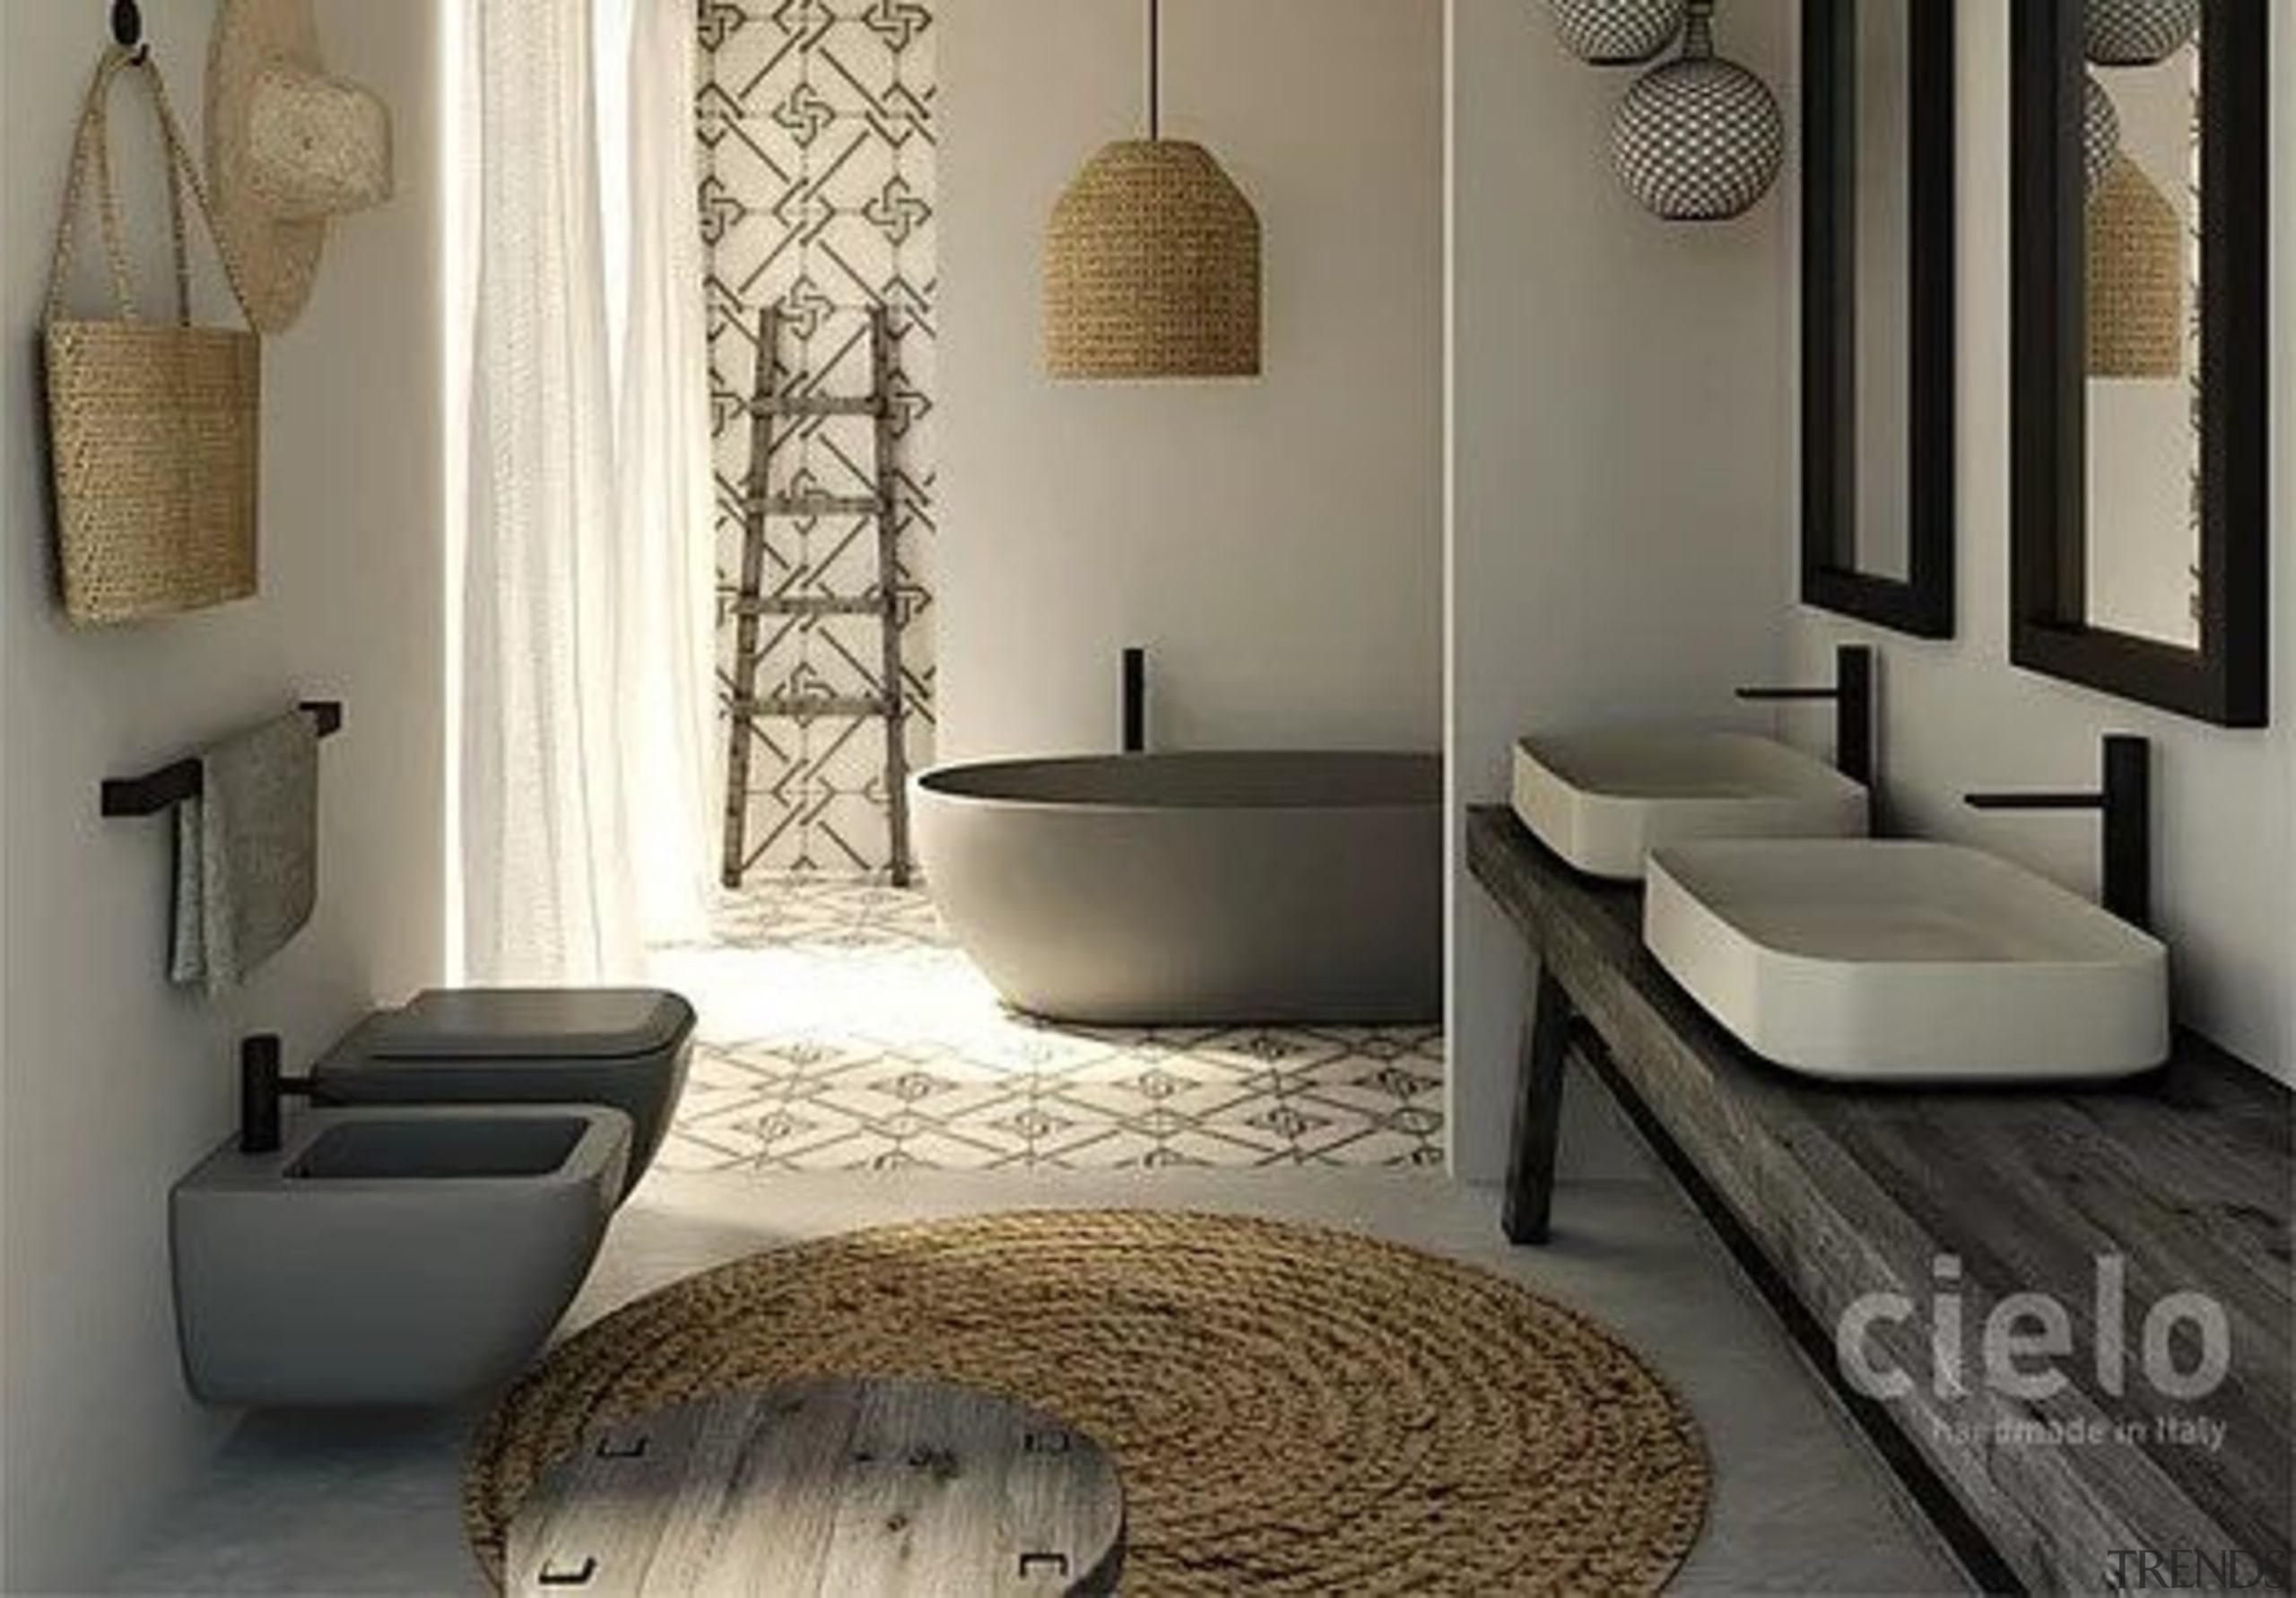 Shui Comfort by Cielo - Shui Comfort by bathroom, floor, flooring, home, interior design, living room, room, tile, gray, black